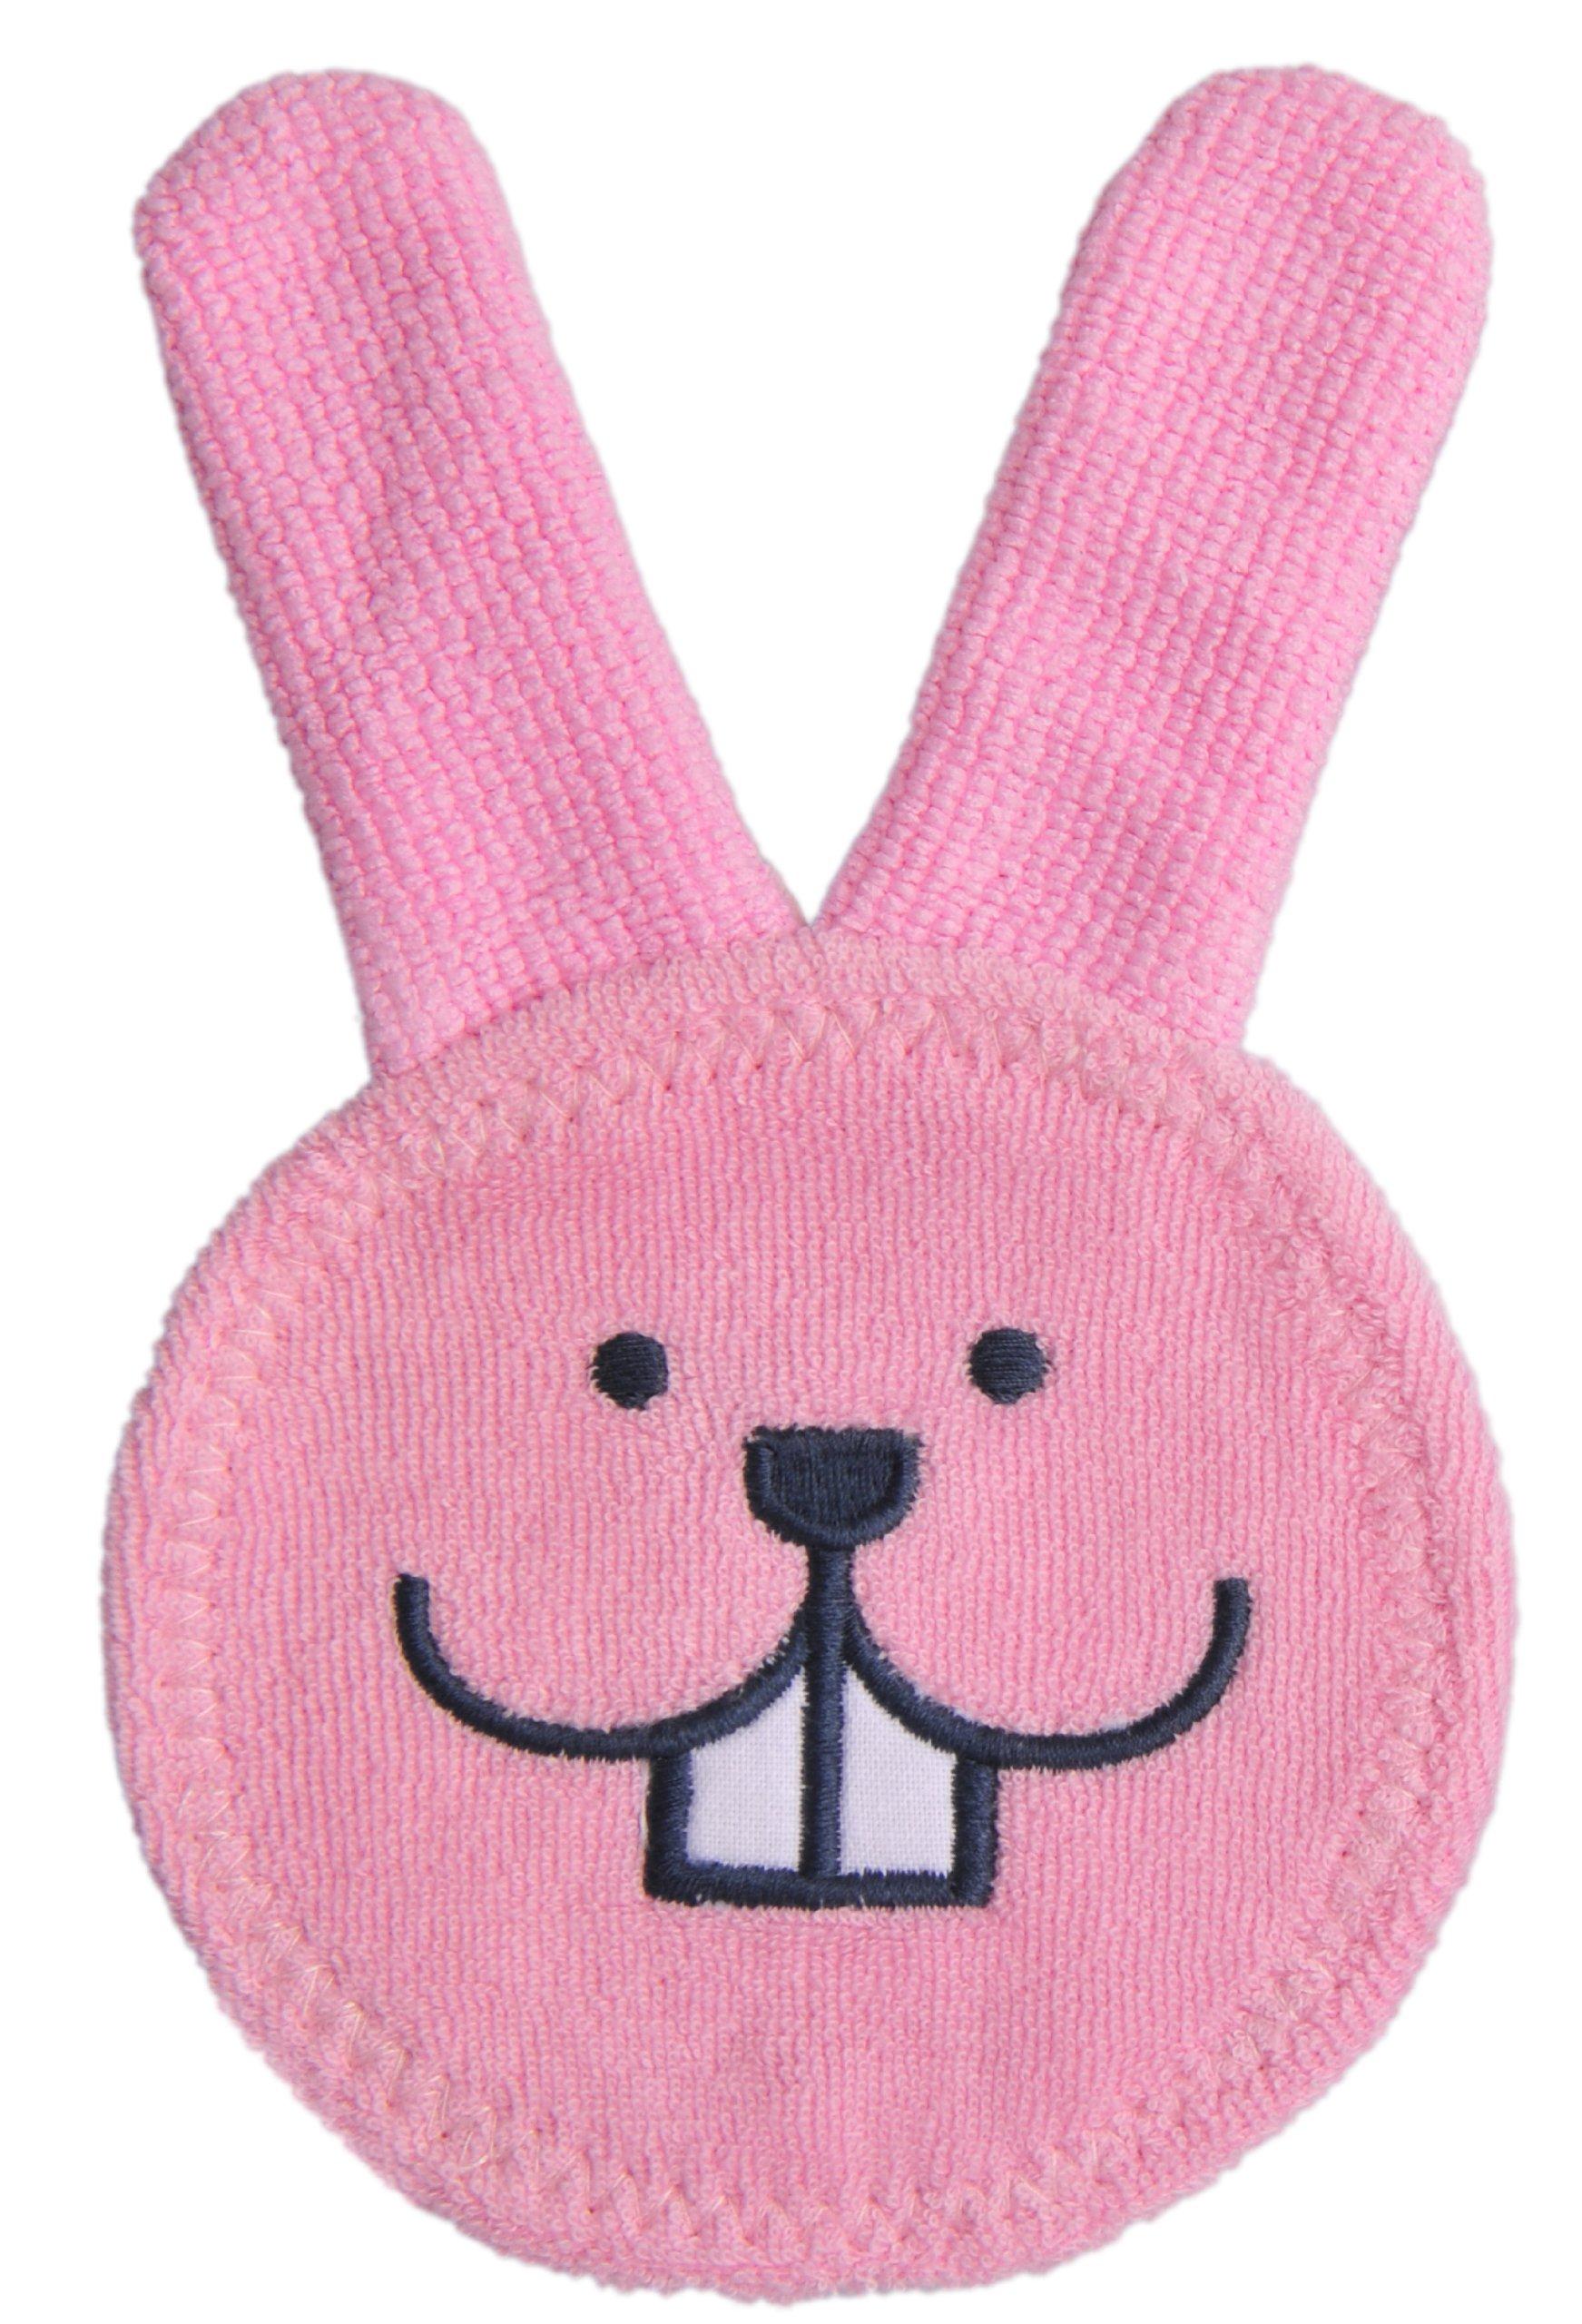 MAM Oral Care Rabbit, Pink, 3 Plus Months